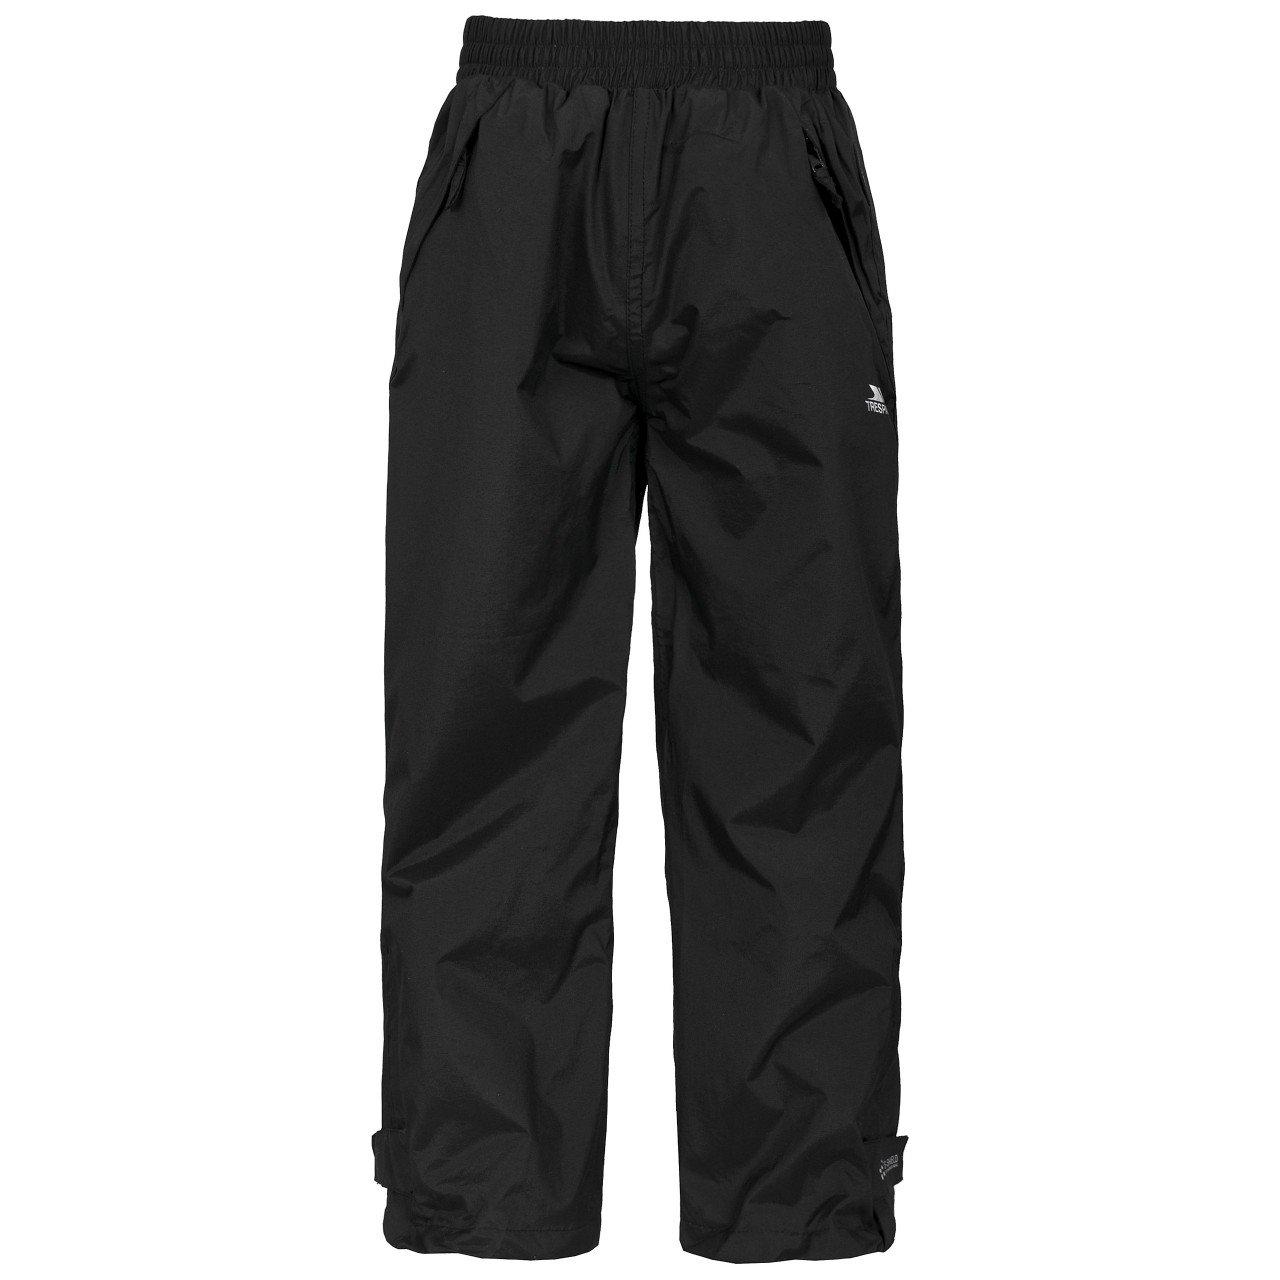 Trespass Childrens//Kids Echo Waterproof Trousers